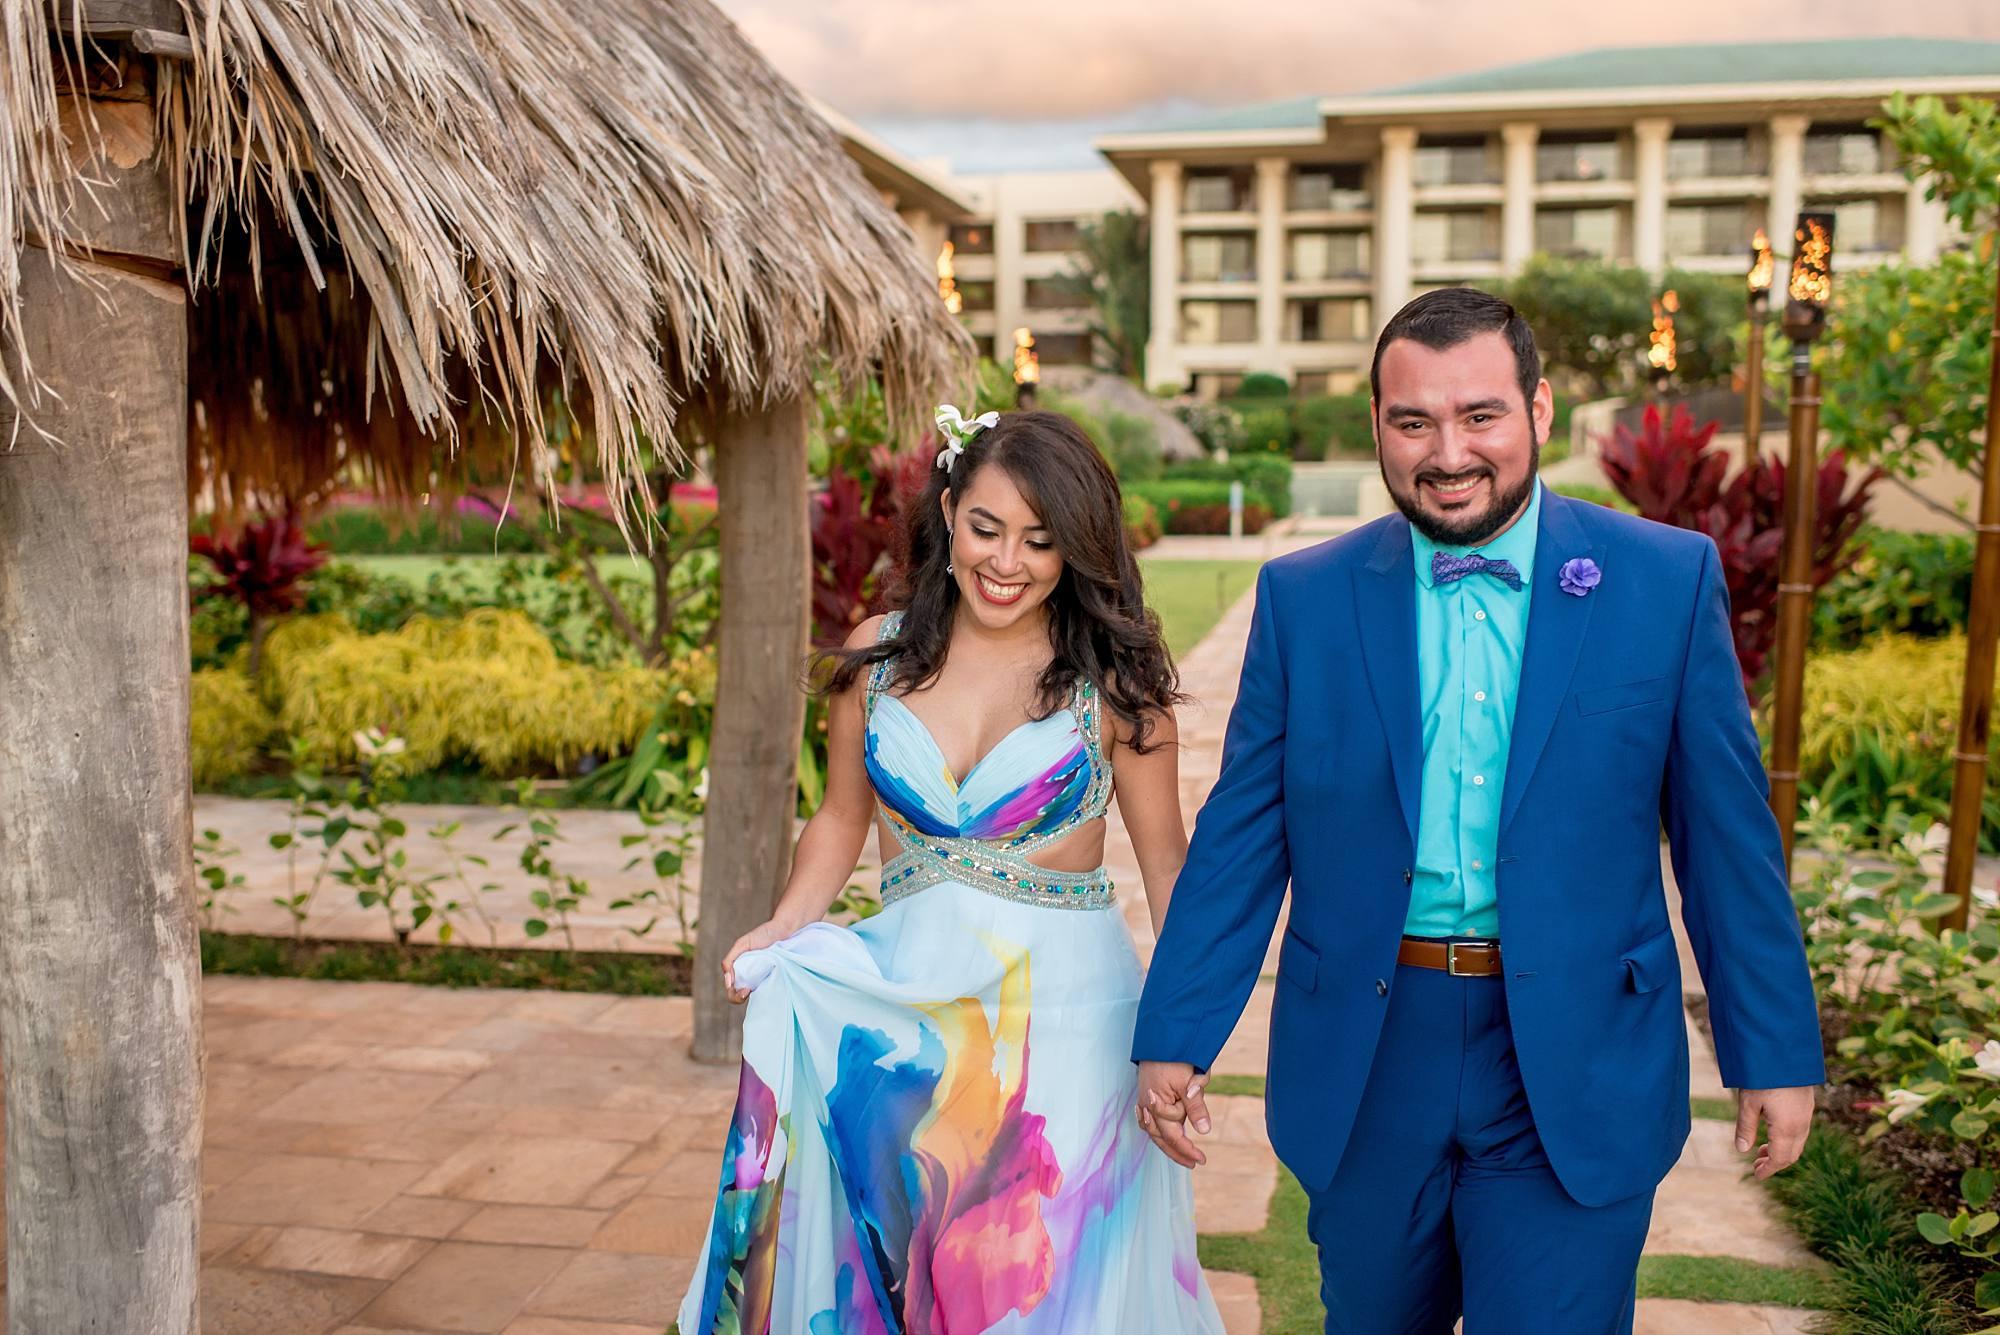 new fiances holding hands walking toward camera